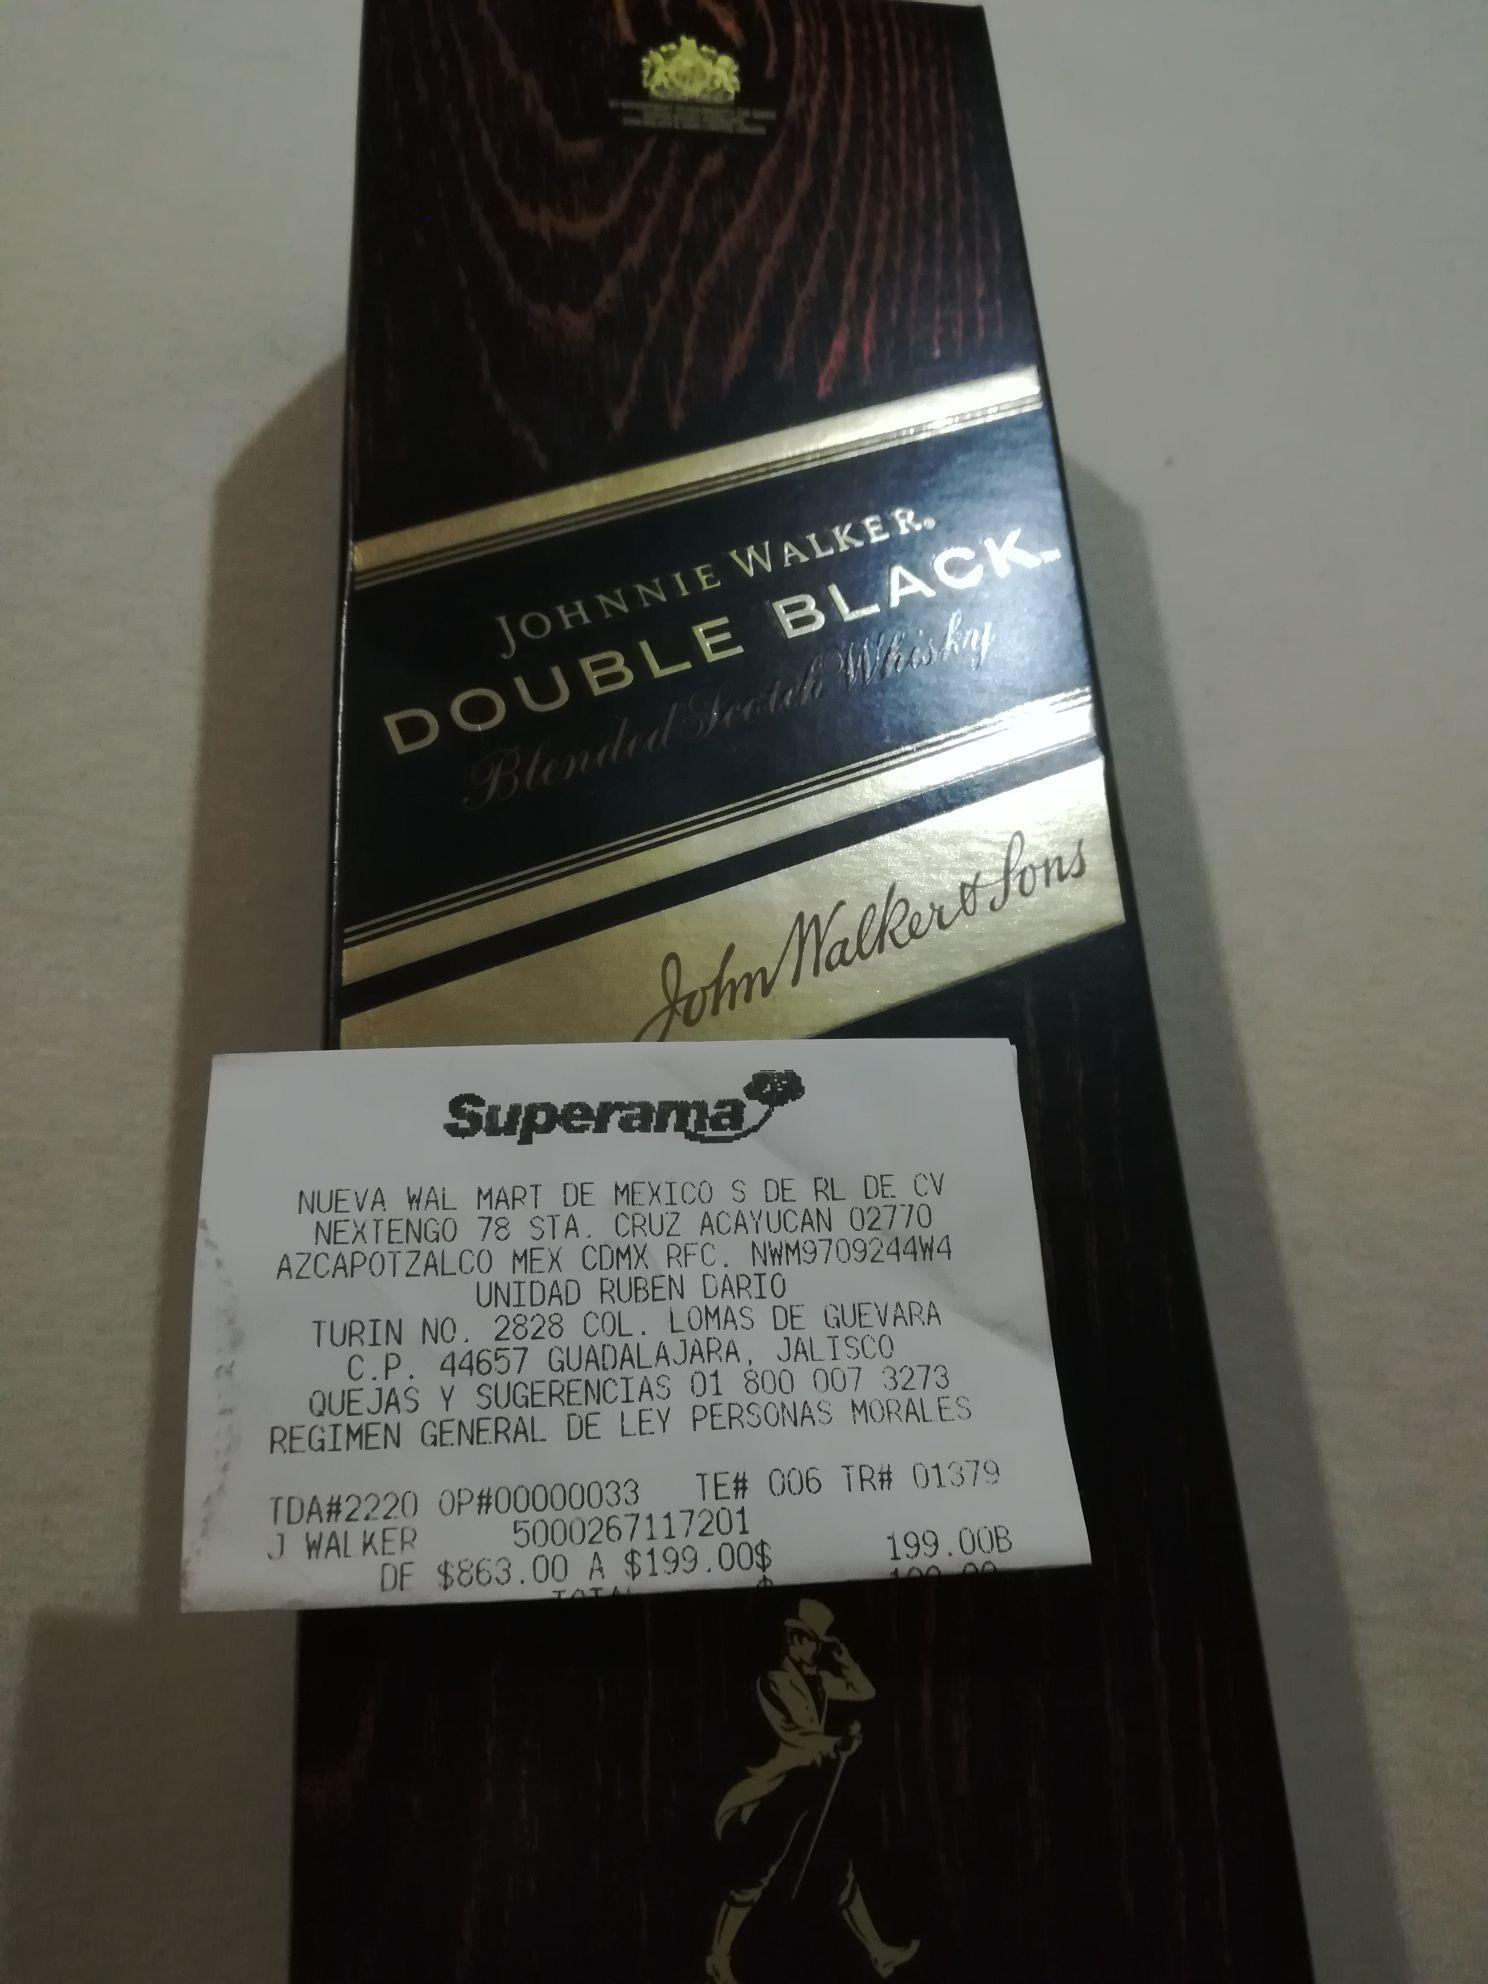 Superama: Johnny Walker Double Black